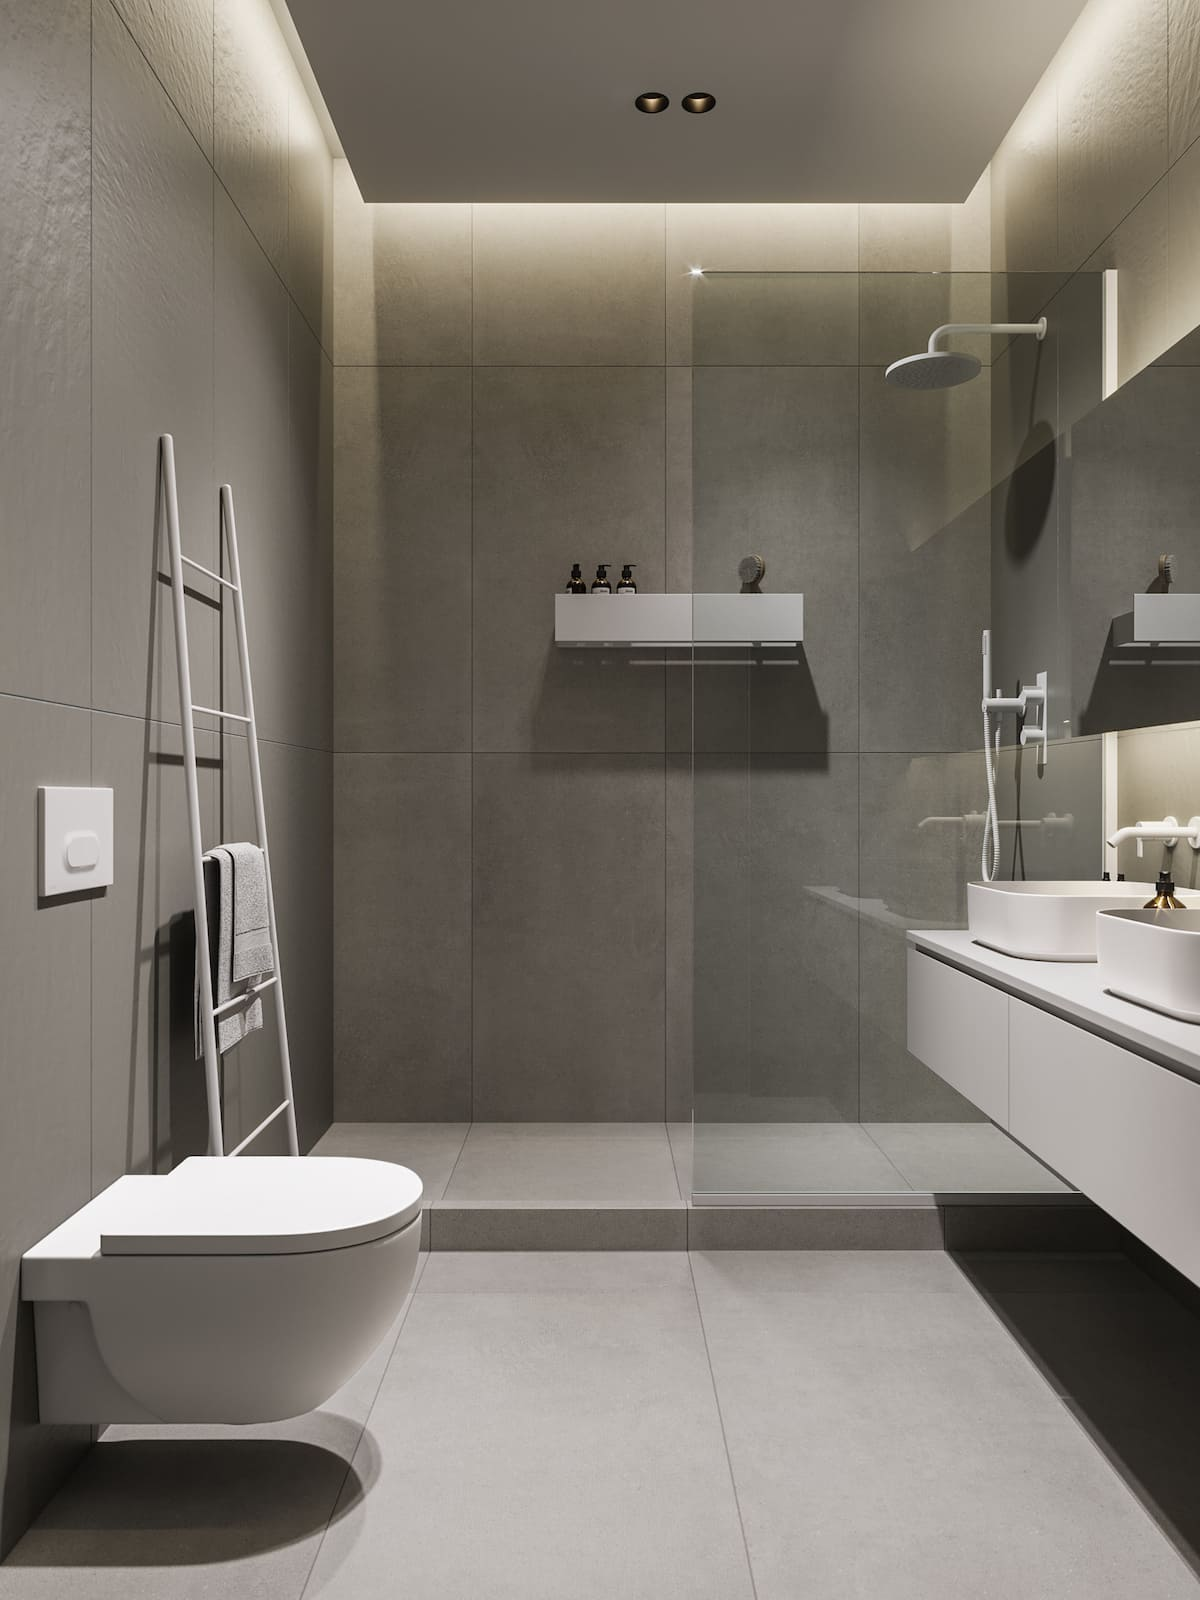 дизайн интерьера модной квартиры фото 52